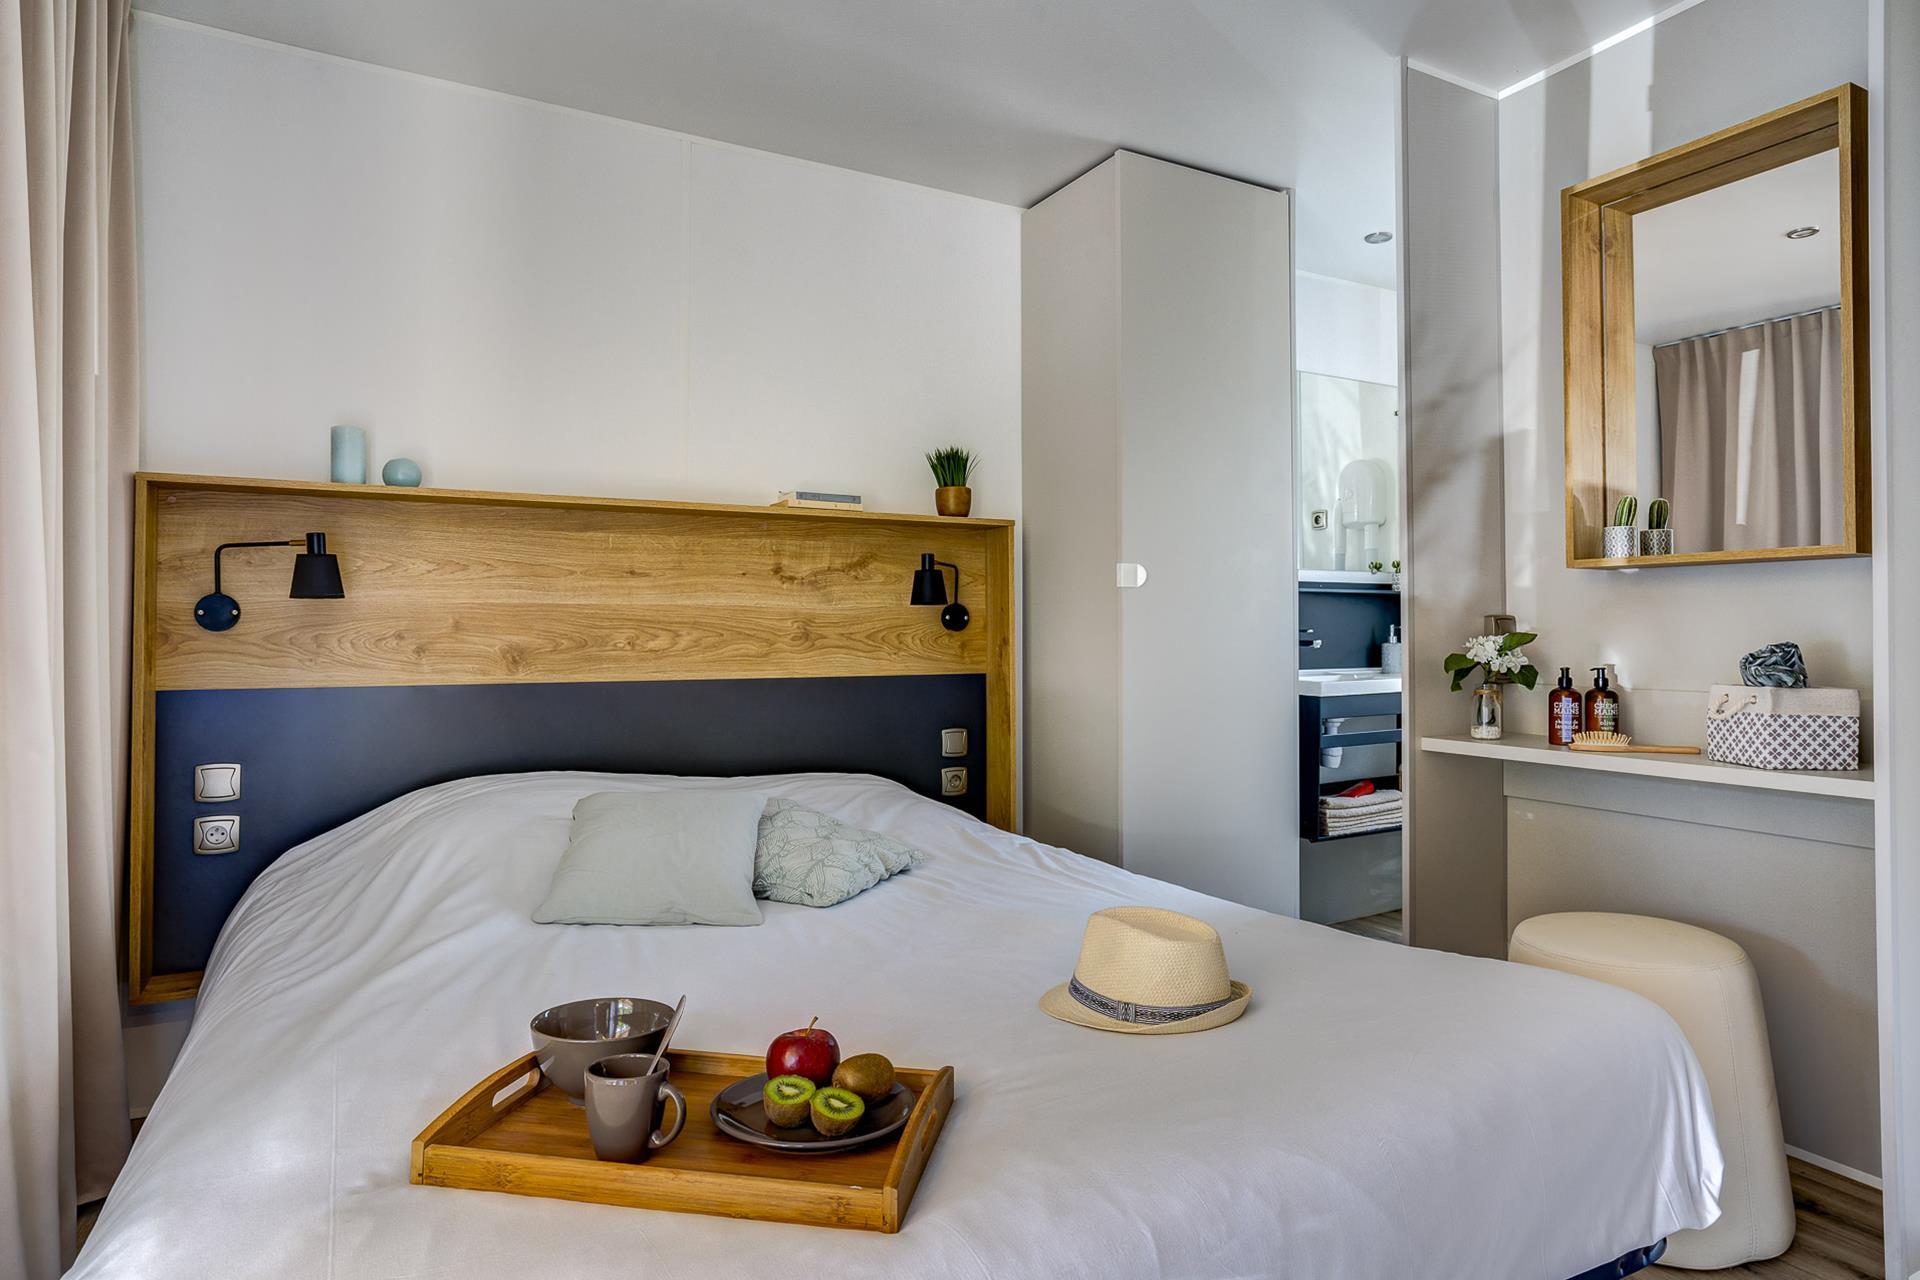 Location - Cottage Atlantide 2 Chambres Climatisé Premium - Camping Sandaya Soulac Plage